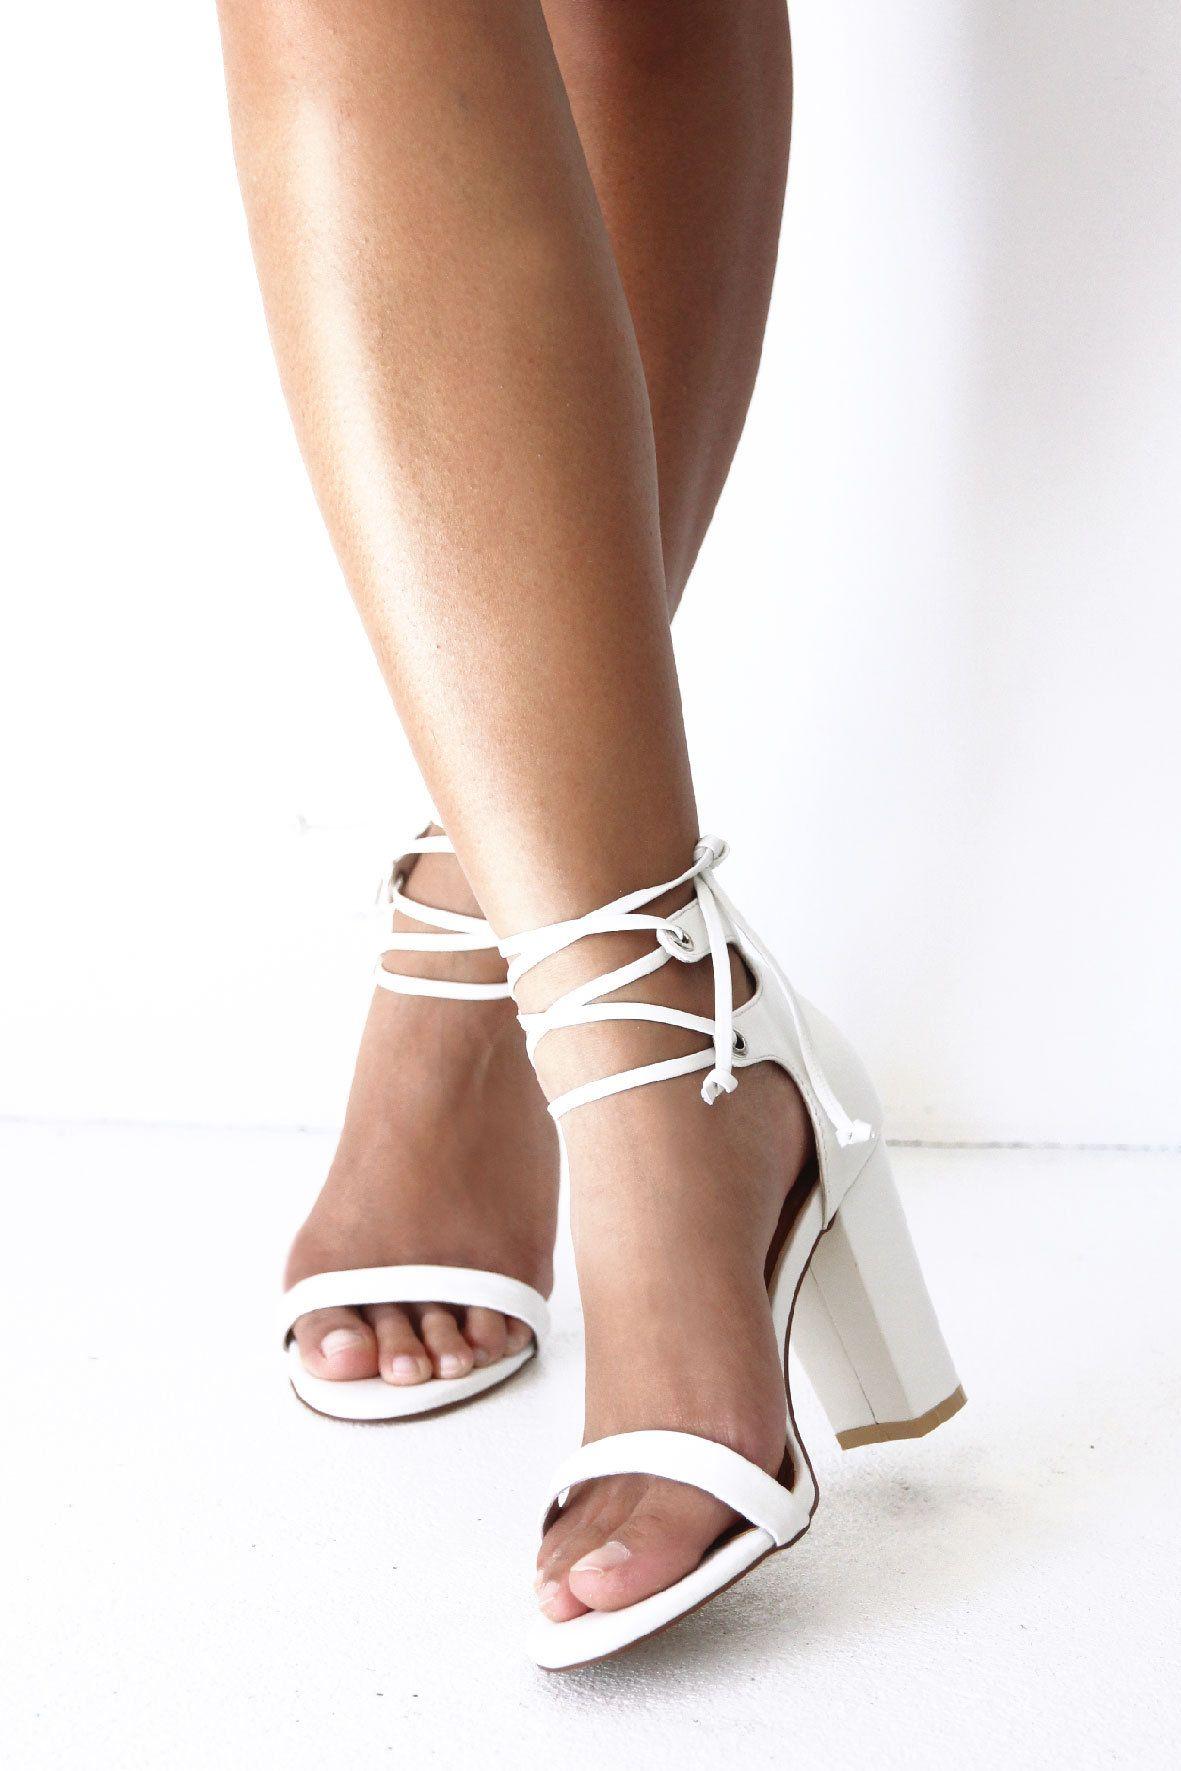 56f0a753548 Ladies Ivory Leather Block Heels